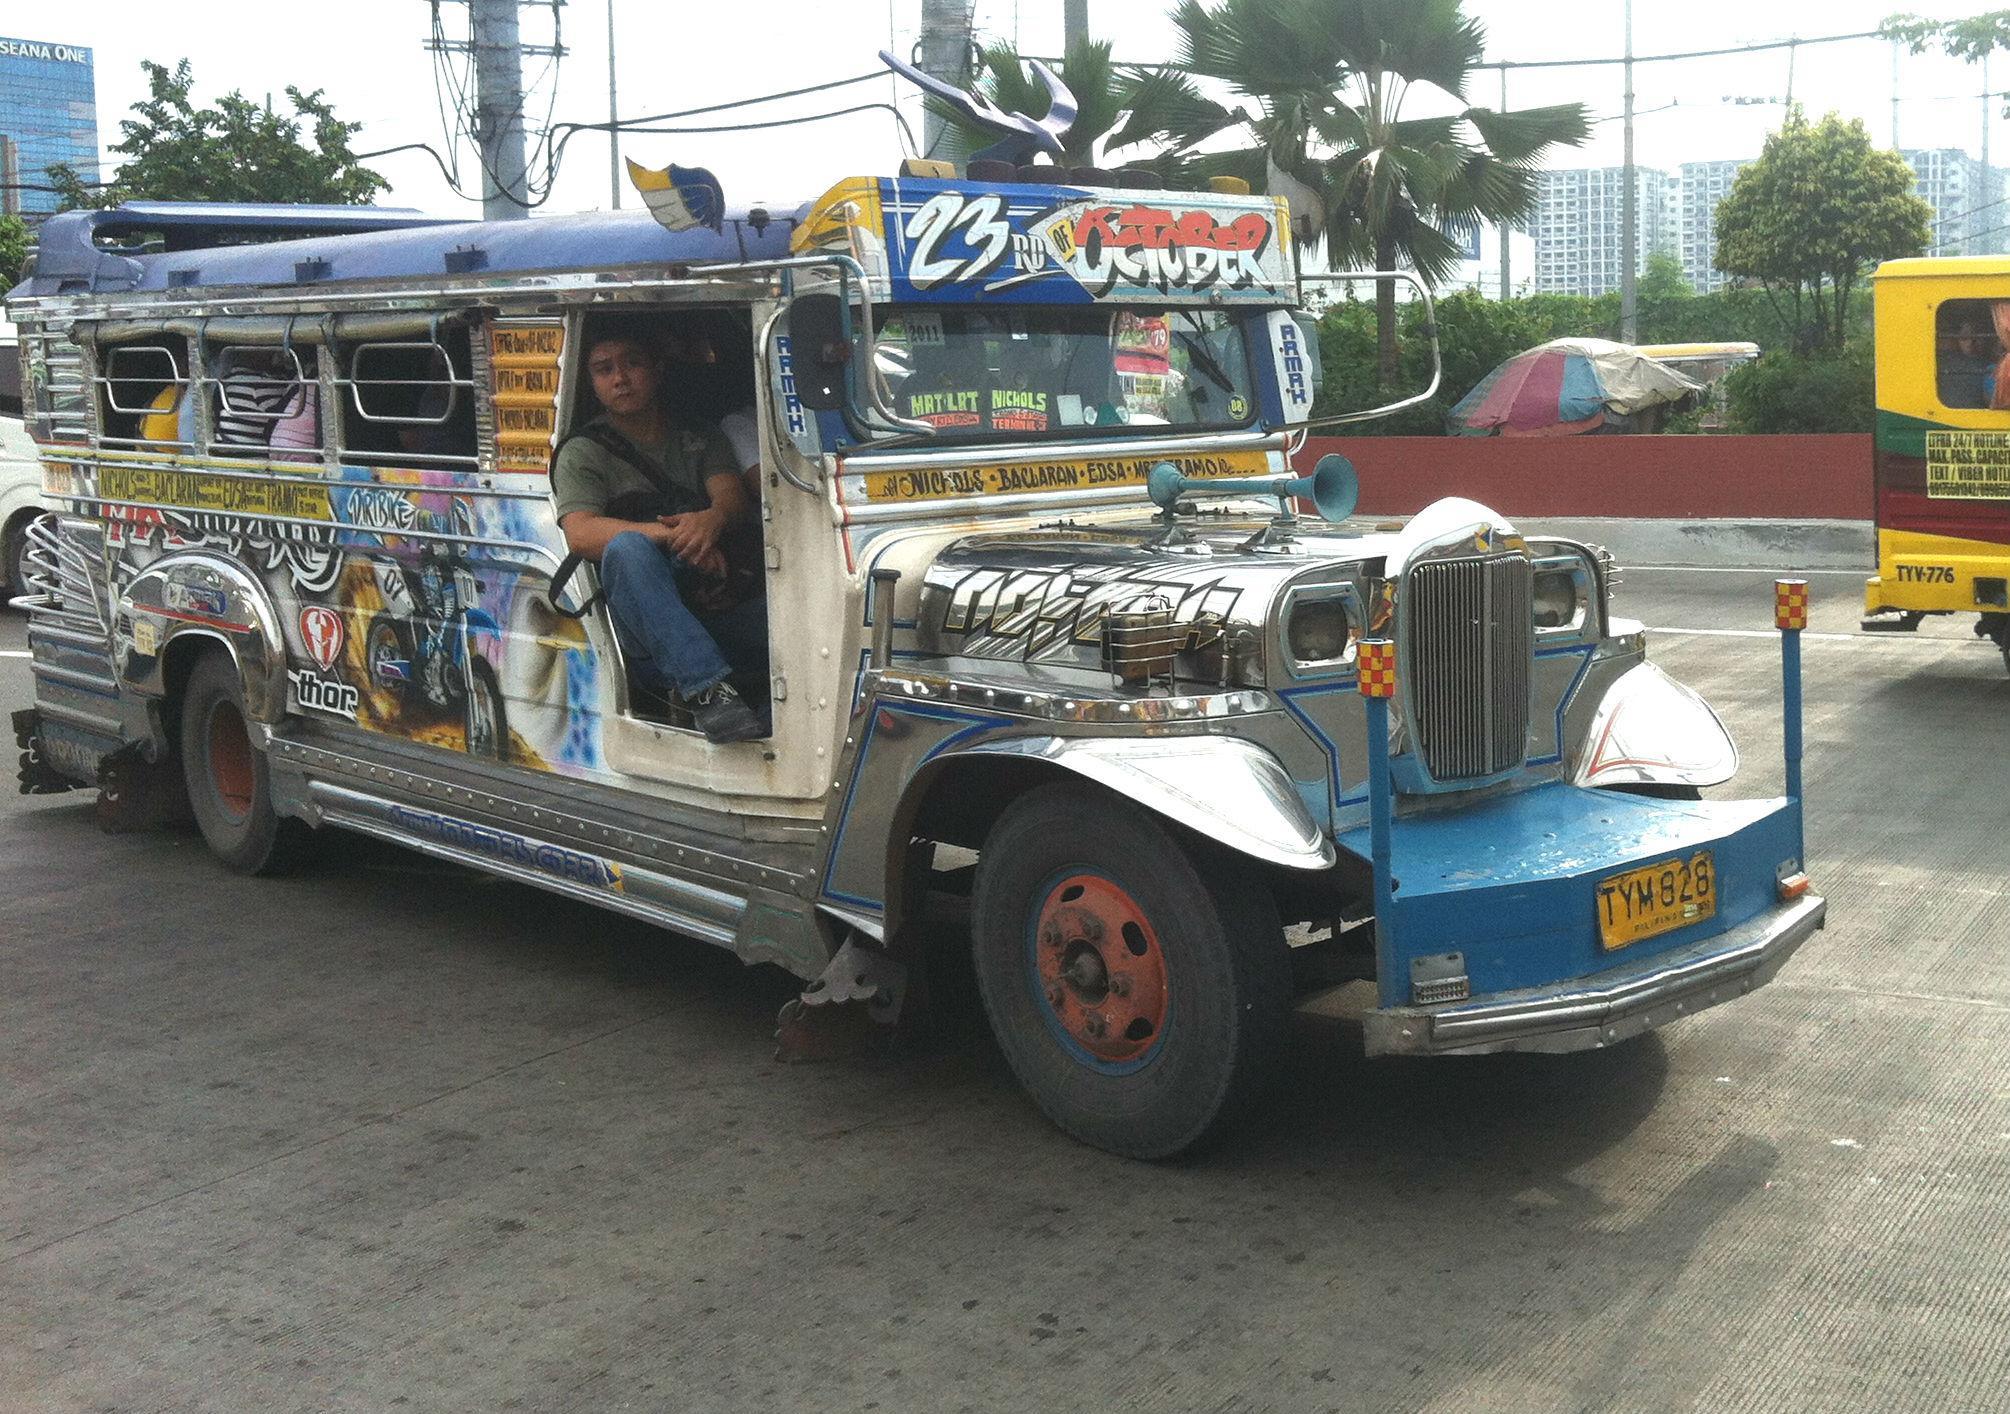 http://blog.cebu-oh.com/basic/2016/09/photo/jeepney.JPG